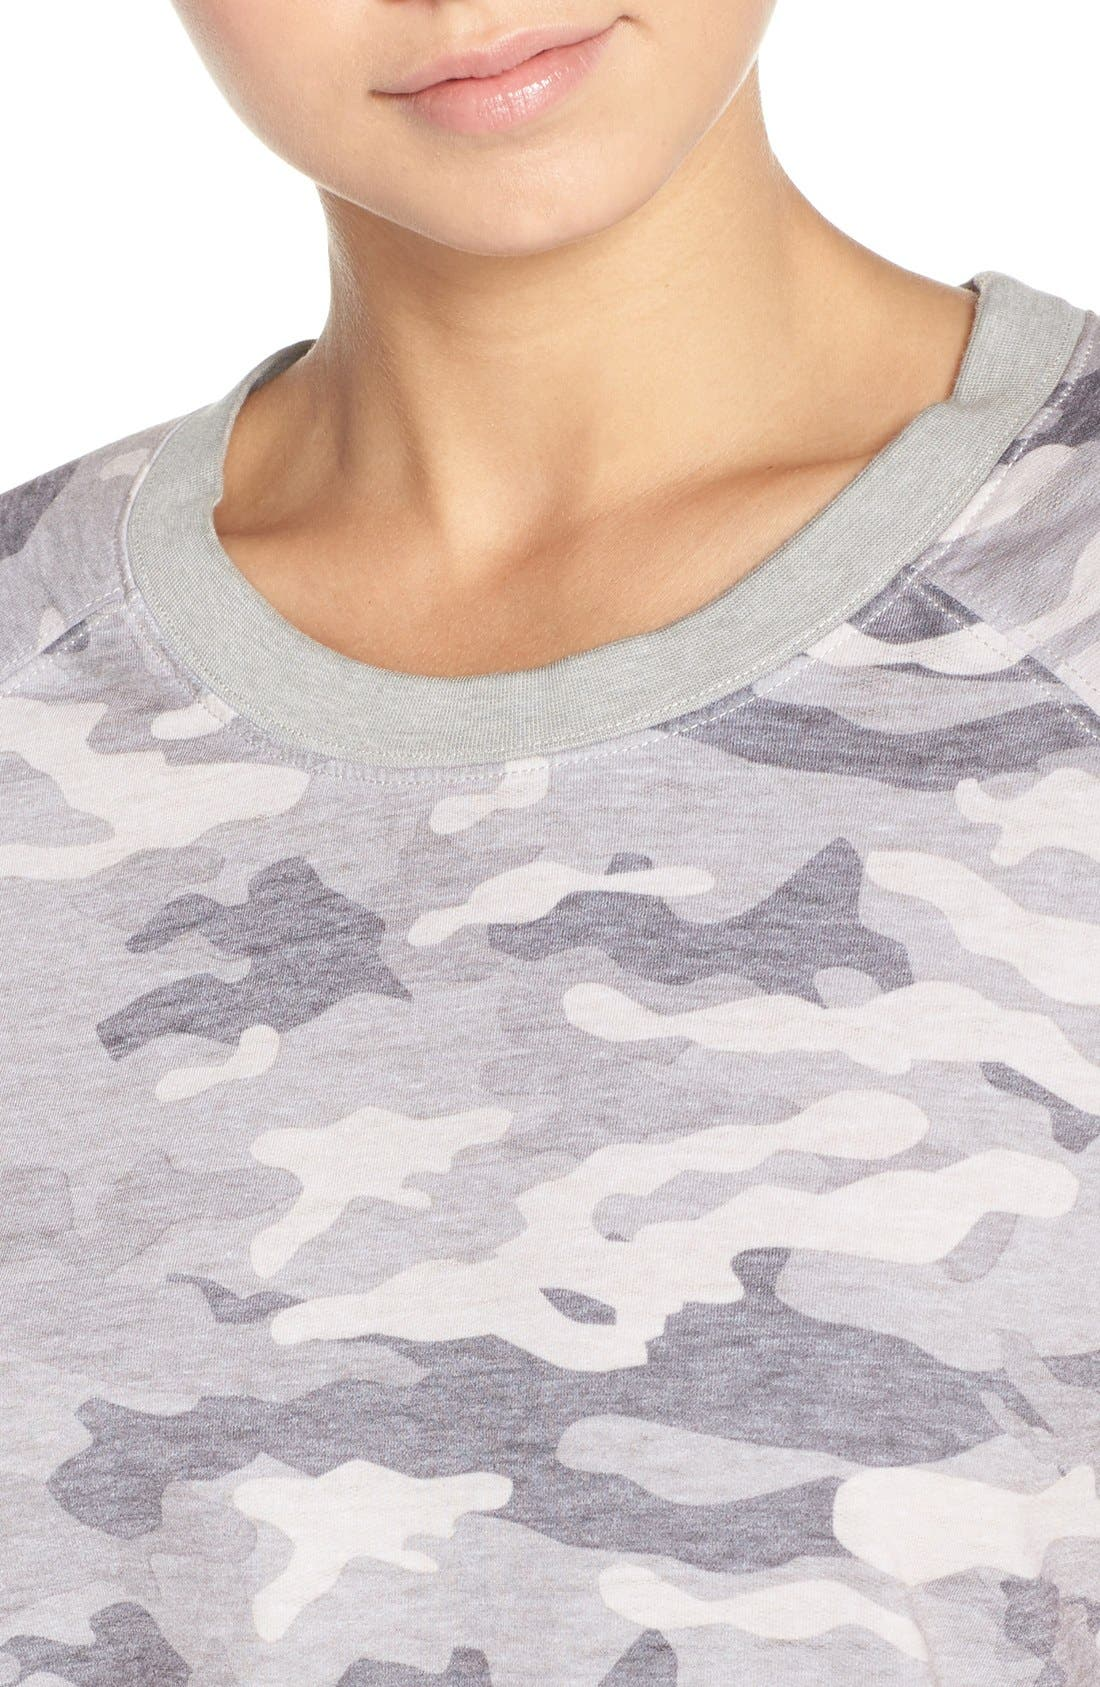 Burnout Lounge Sweatshirt,                             Alternate thumbnail 4, color,                             Grey Camo